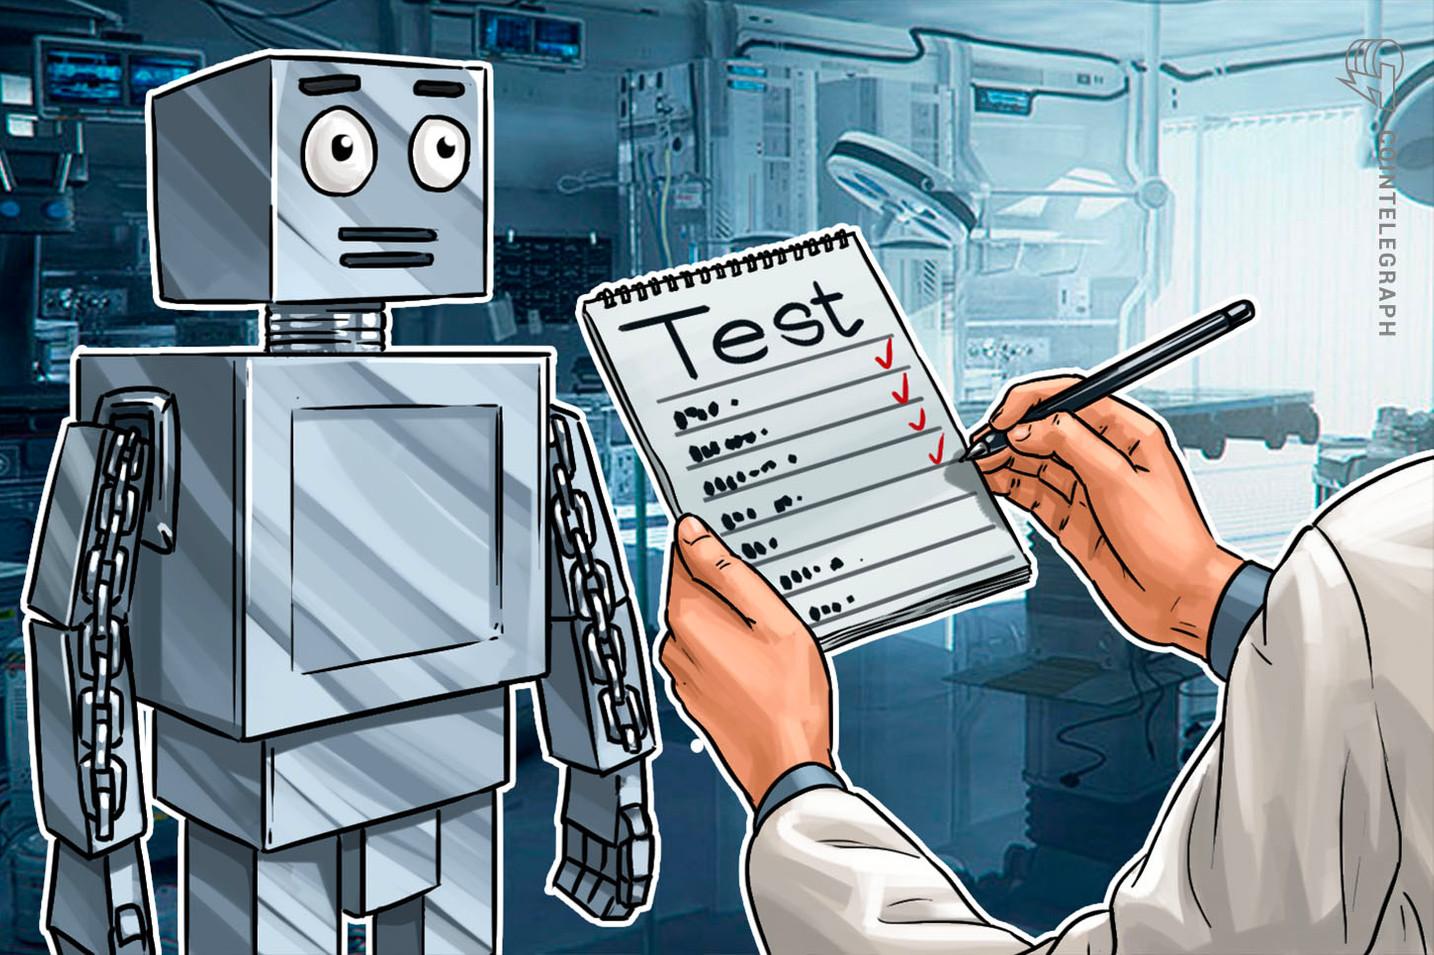 Abu Dhabi Ports Subsidiary Tests International Blockchain Pilot with Port of Antwerp